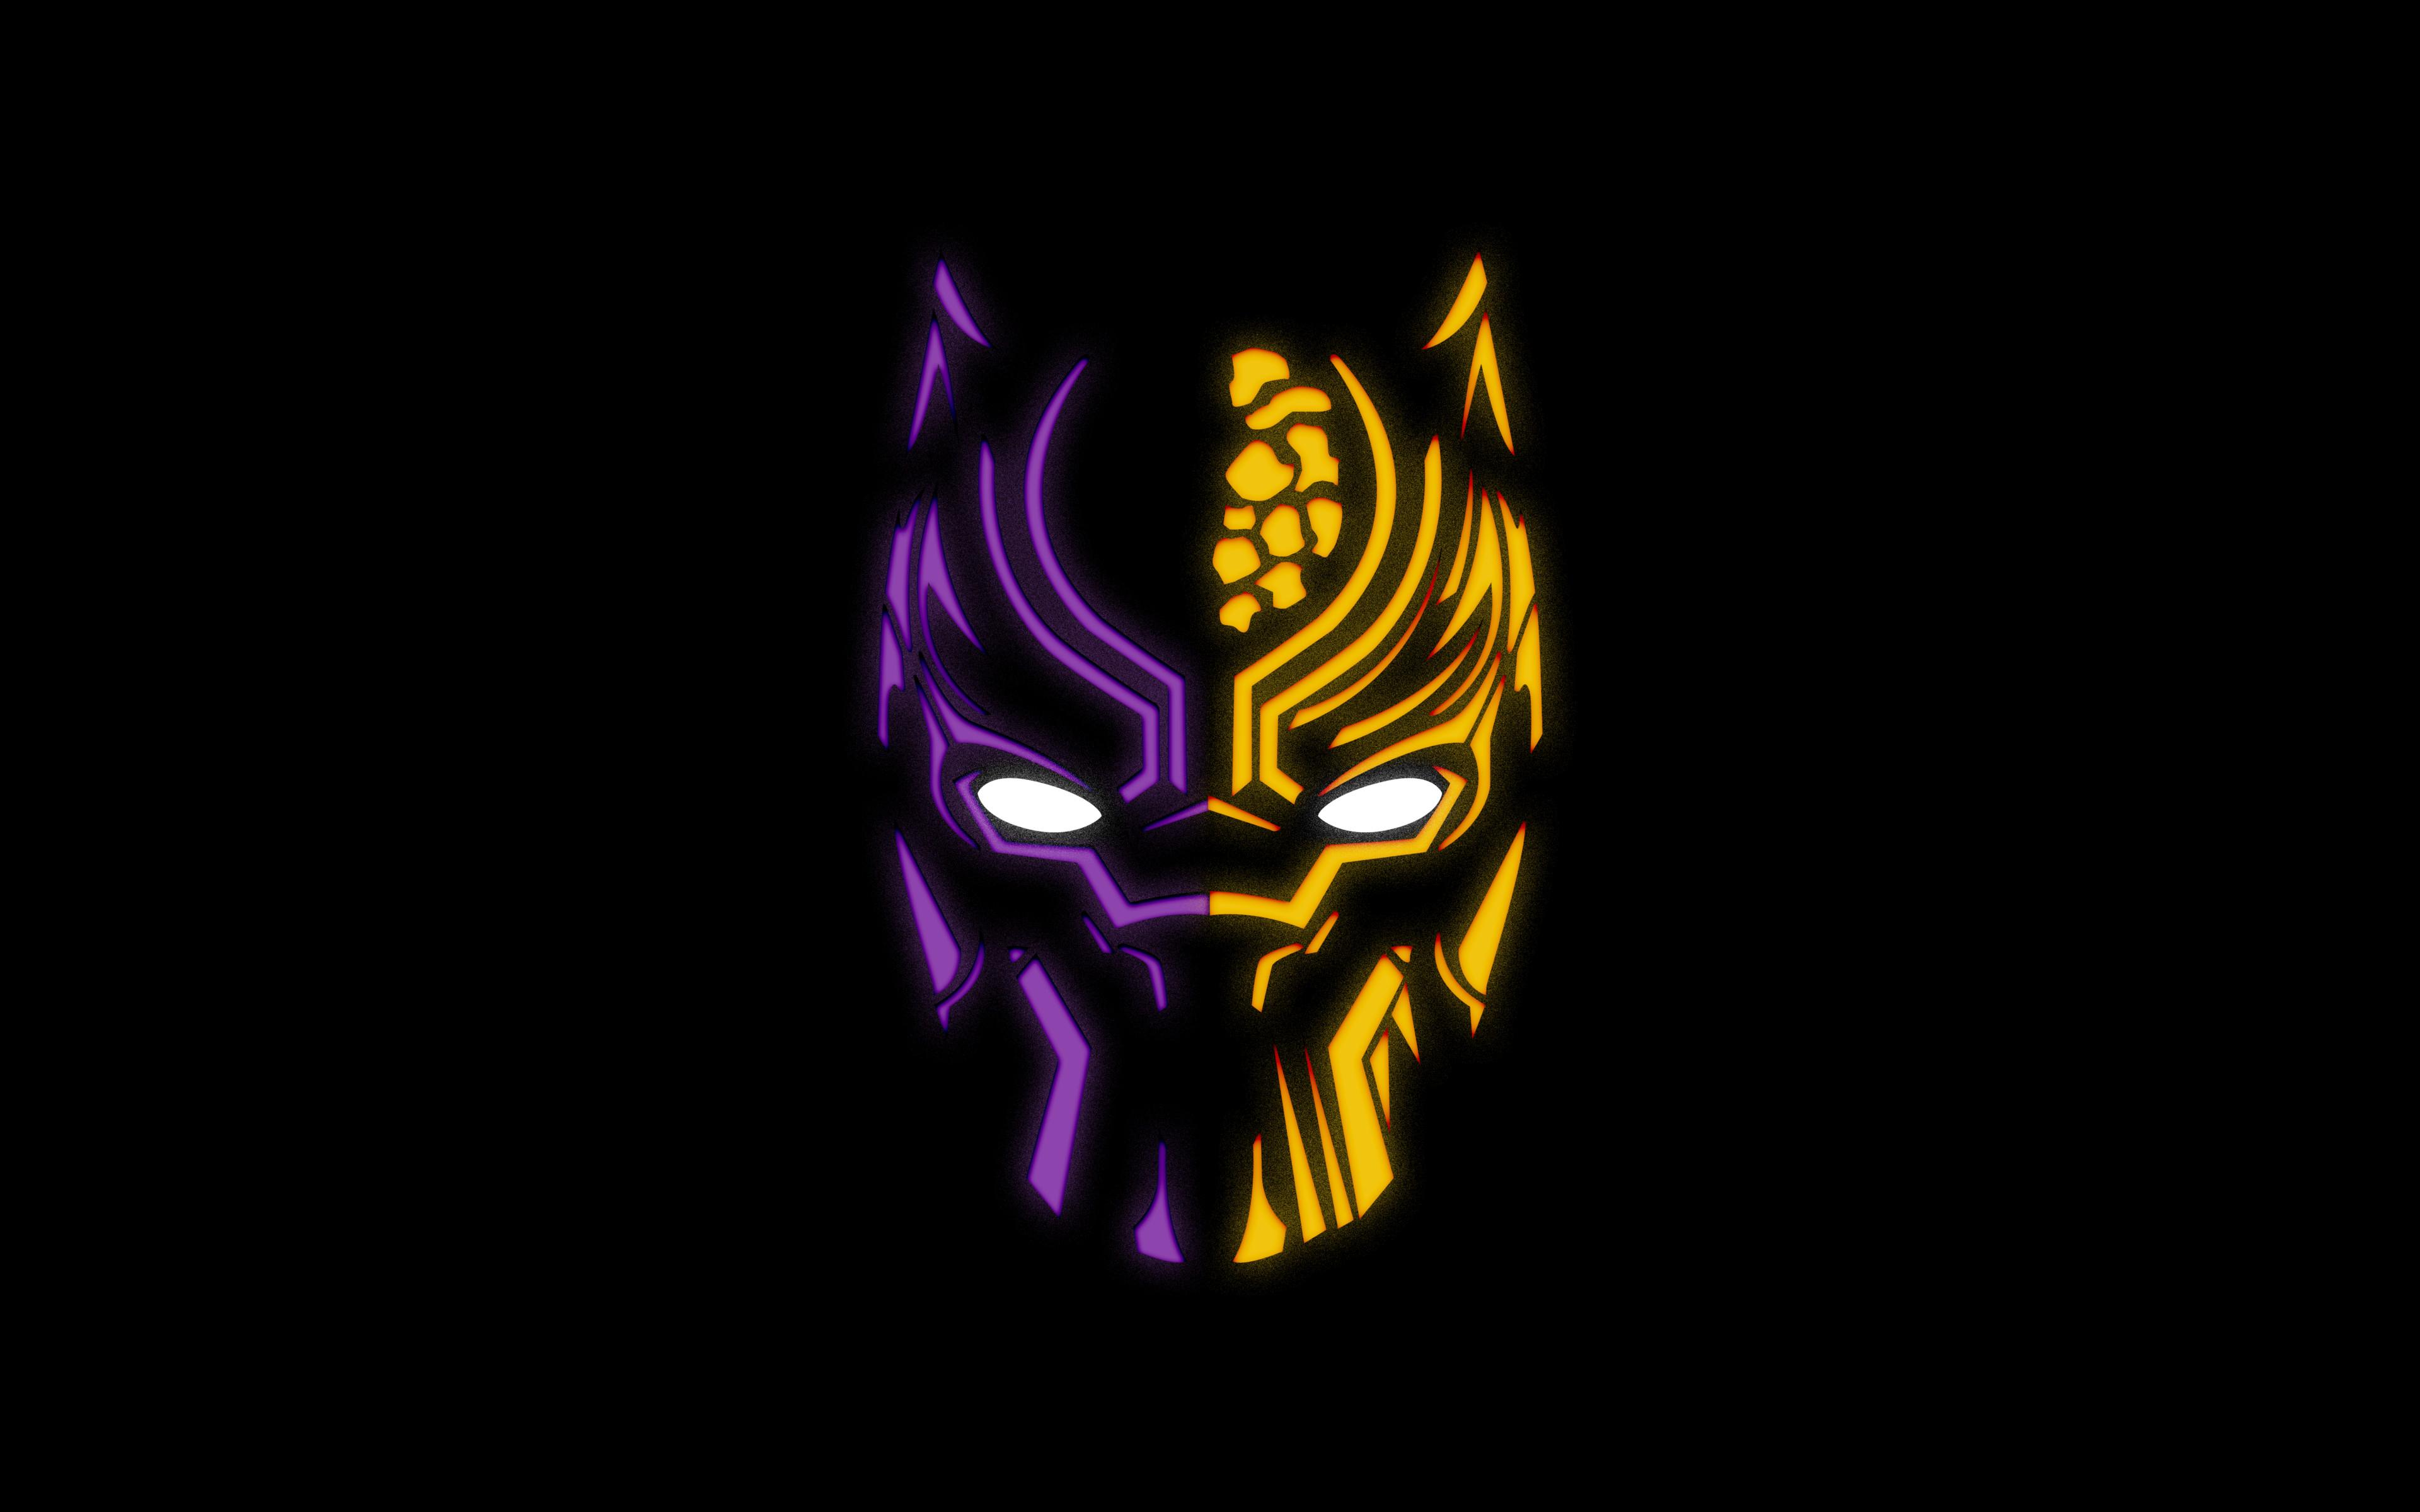 Black Panther 4k 5k Wallpapers Hd Wallpapers